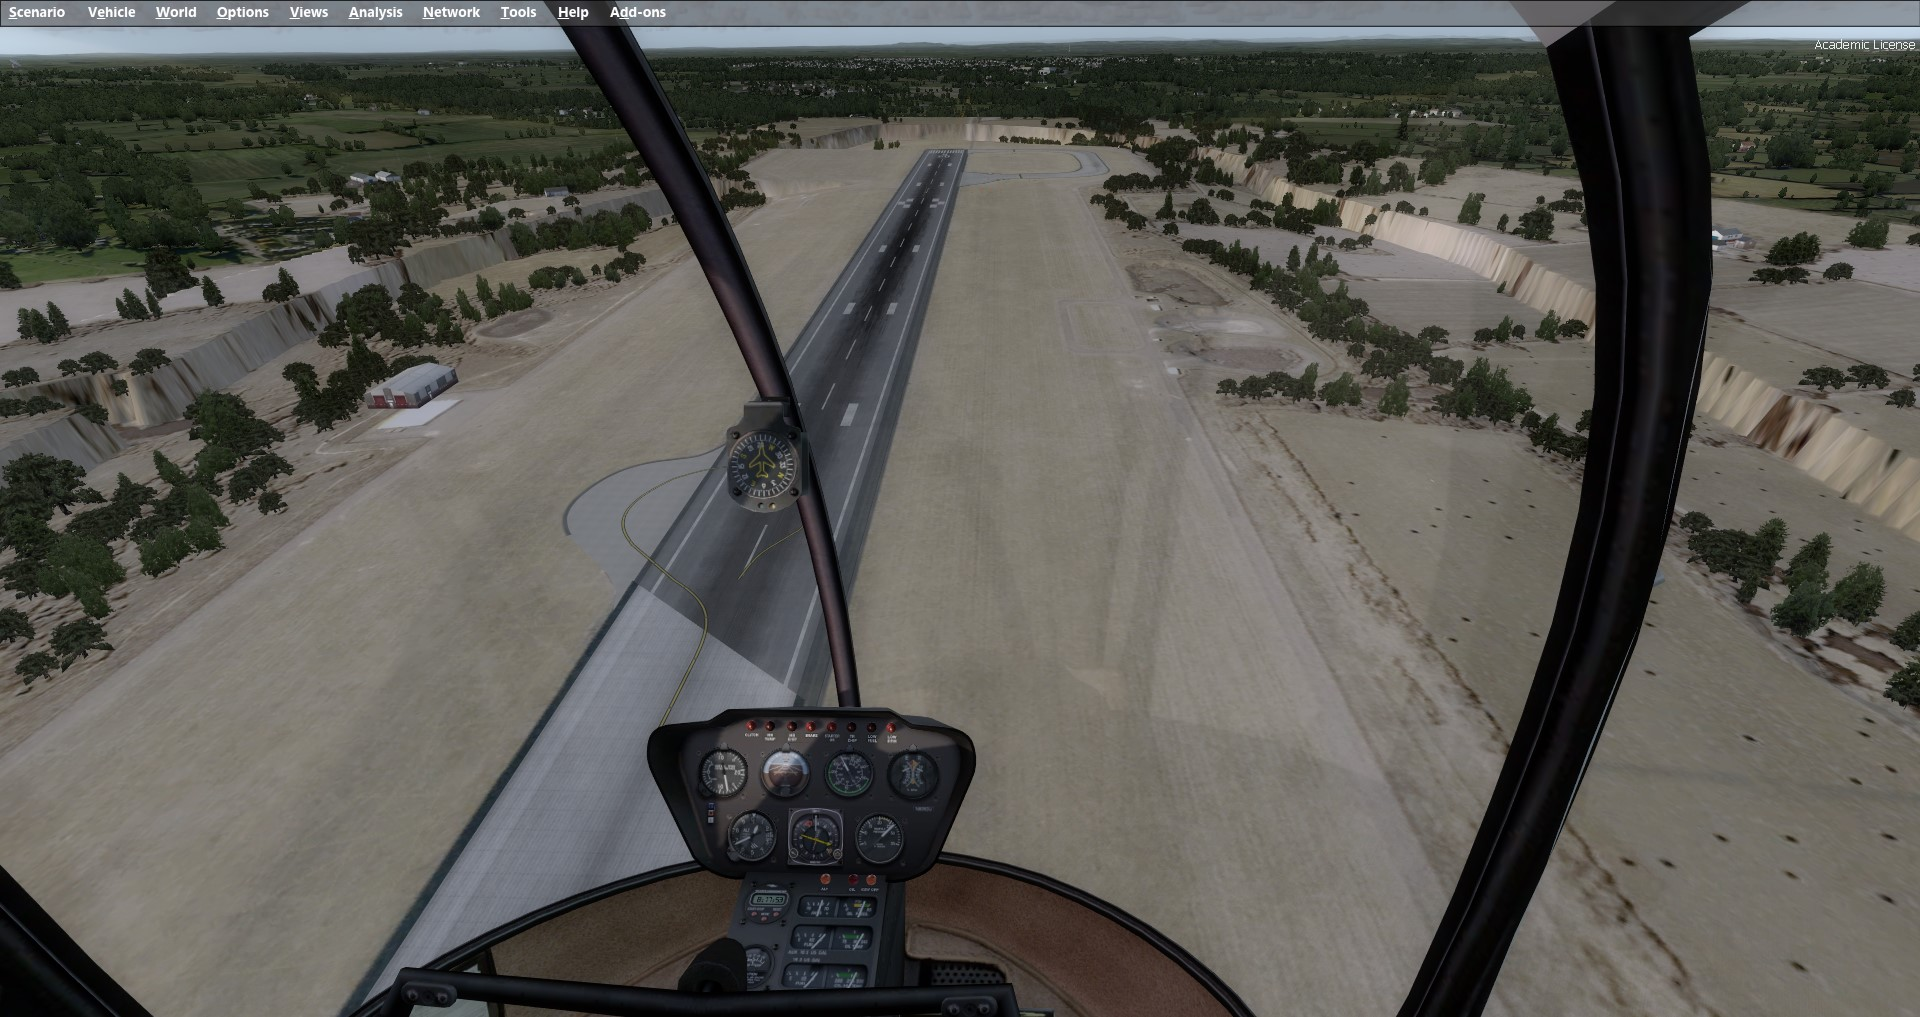 Manchester X Airport Elev problem - Aerosoft Scenery - AEROSOFT